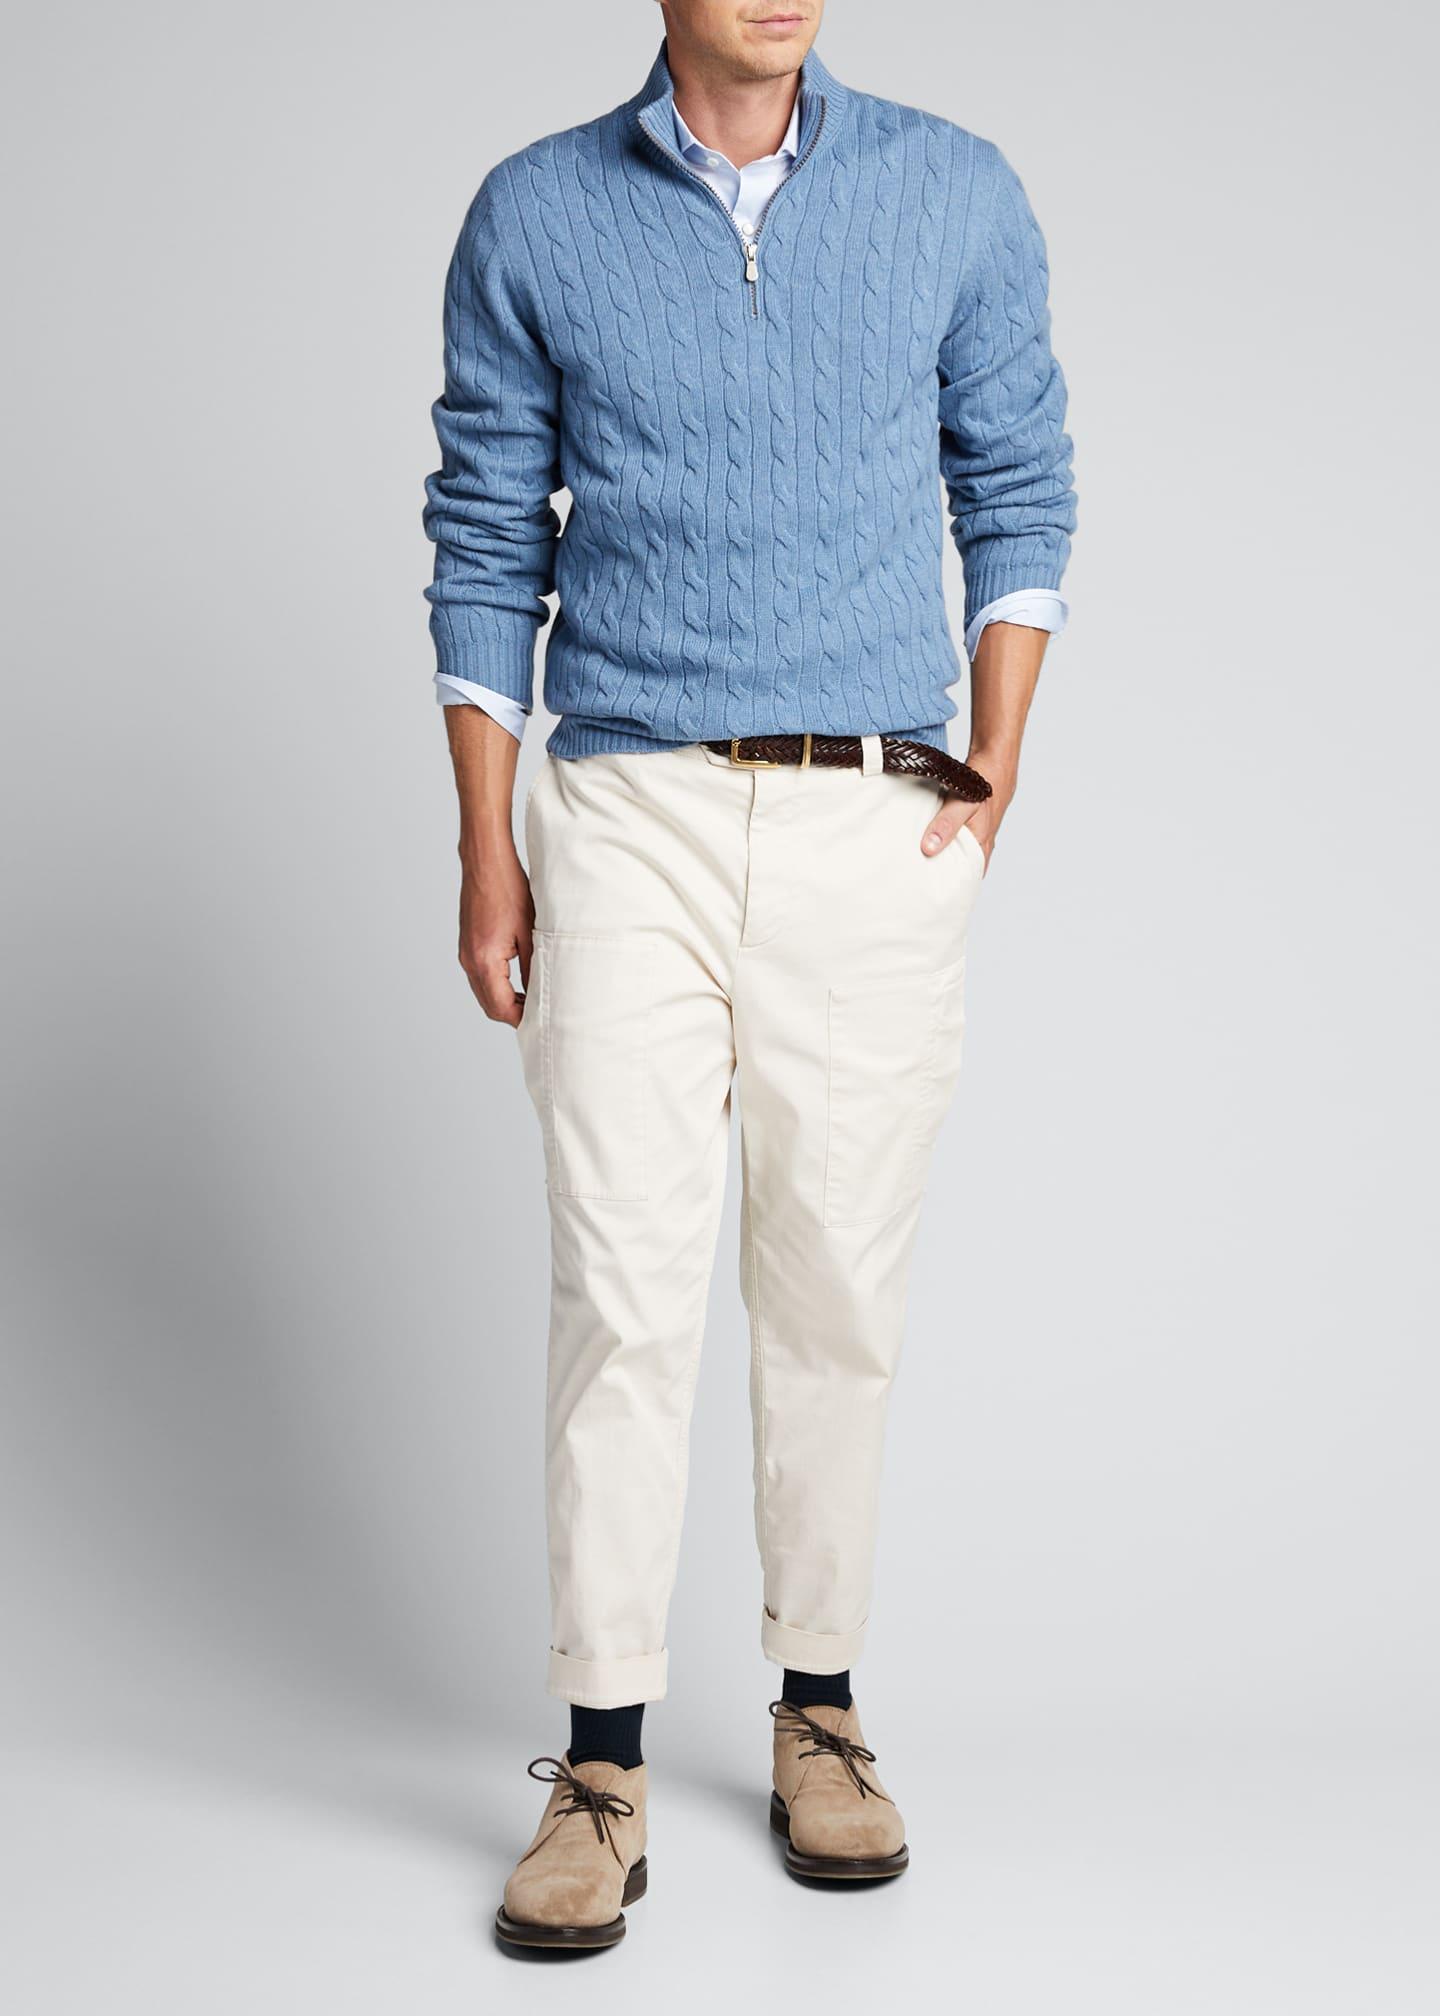 Brunello Cucinelli Men's Cashmere Cable-Knit Quarter-Zip Sweater